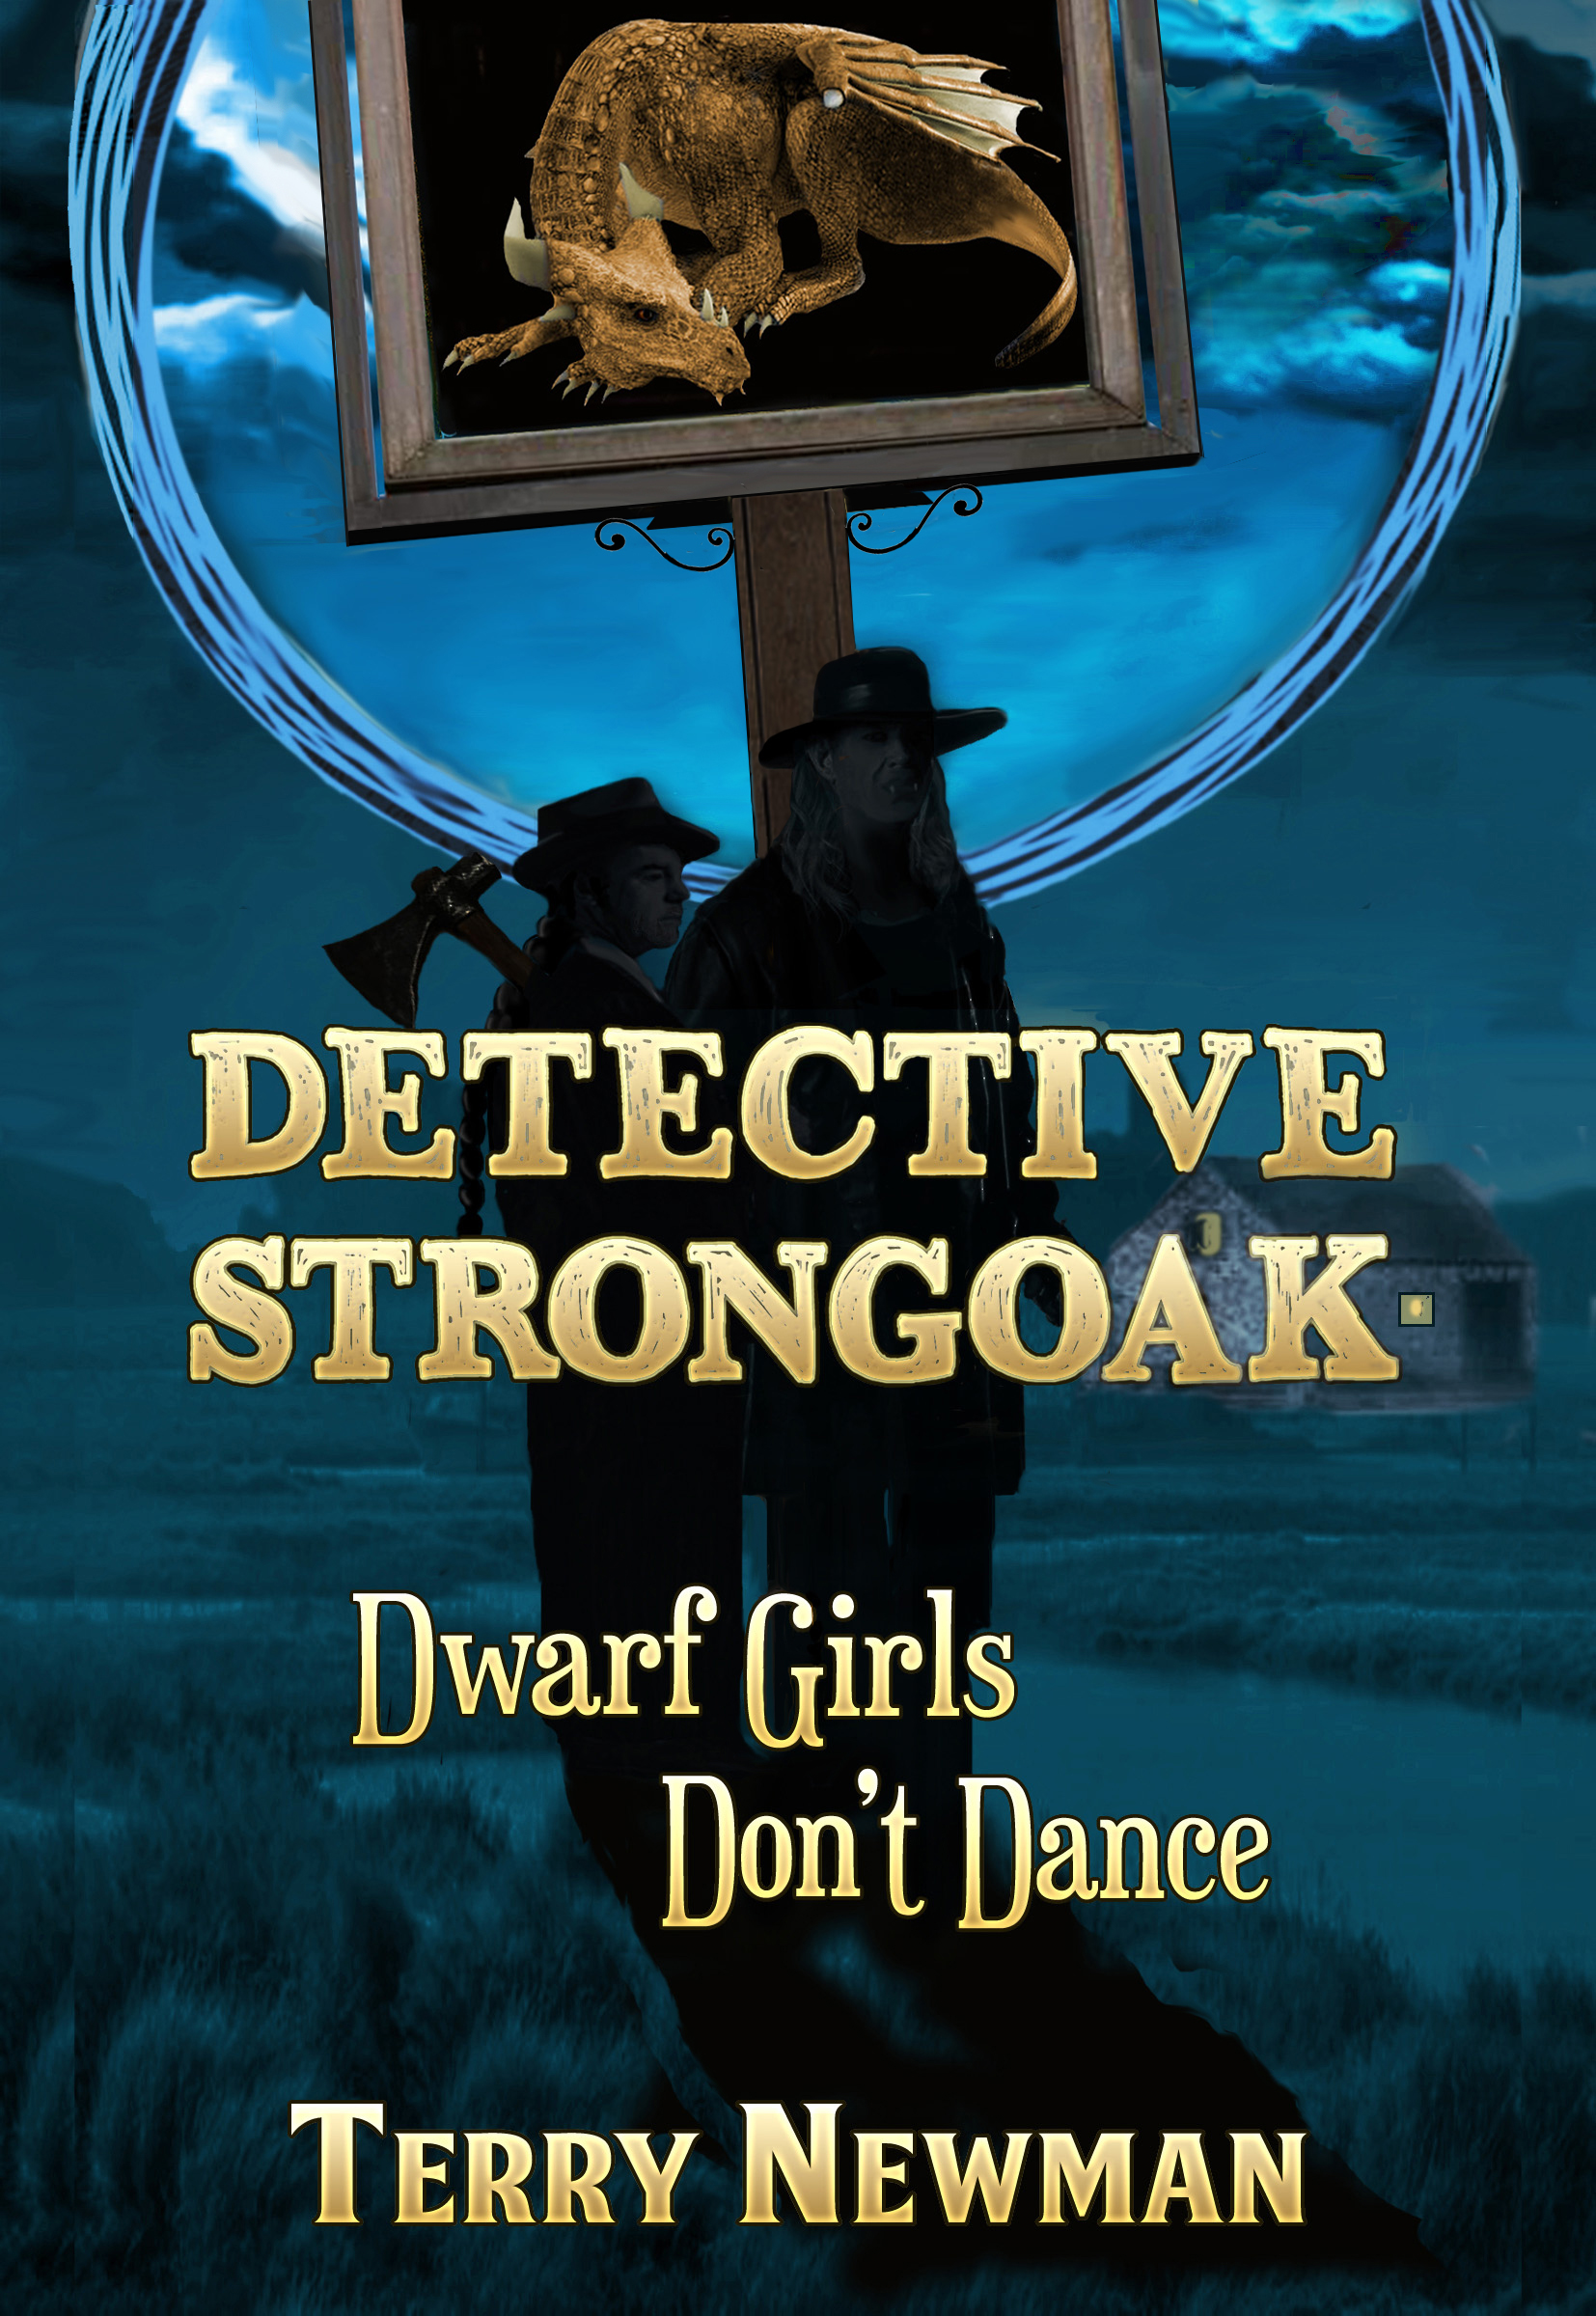 Dwarf Girls Don't Dance ebook cover 24.7.20